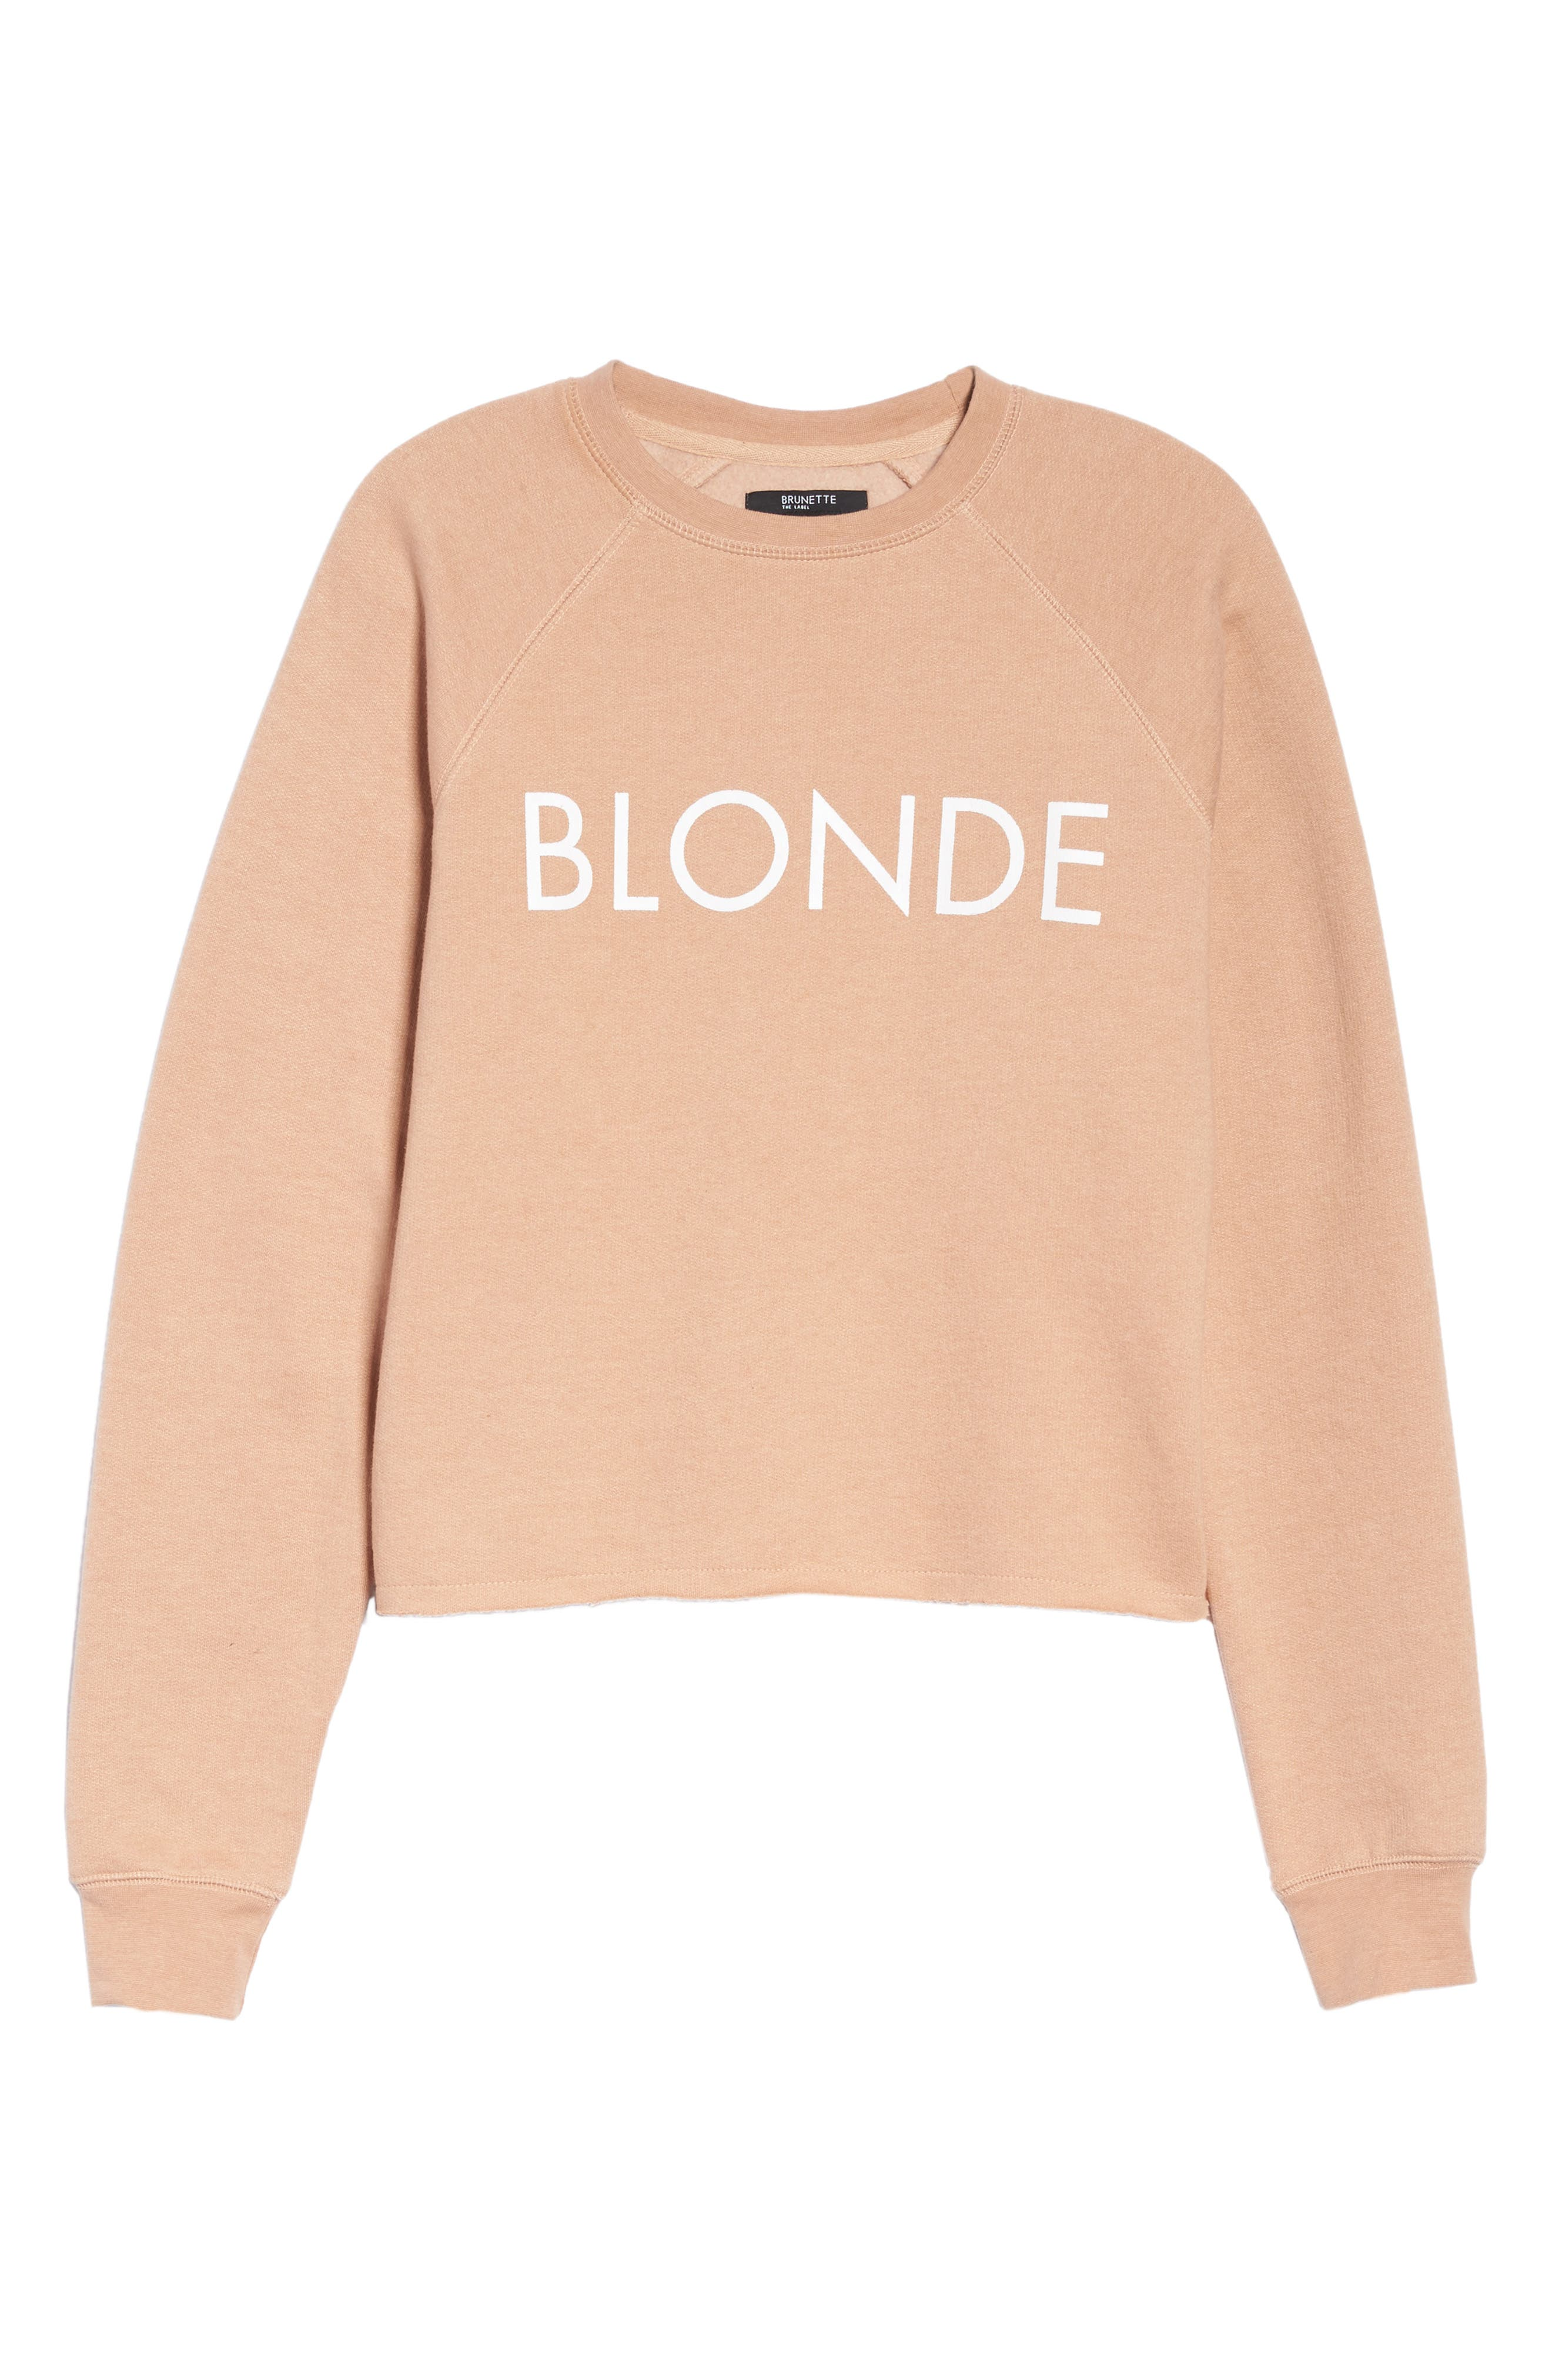 Middle Sister Blonde Sweatshirt,                             Alternate thumbnail 4, color,                             Beige